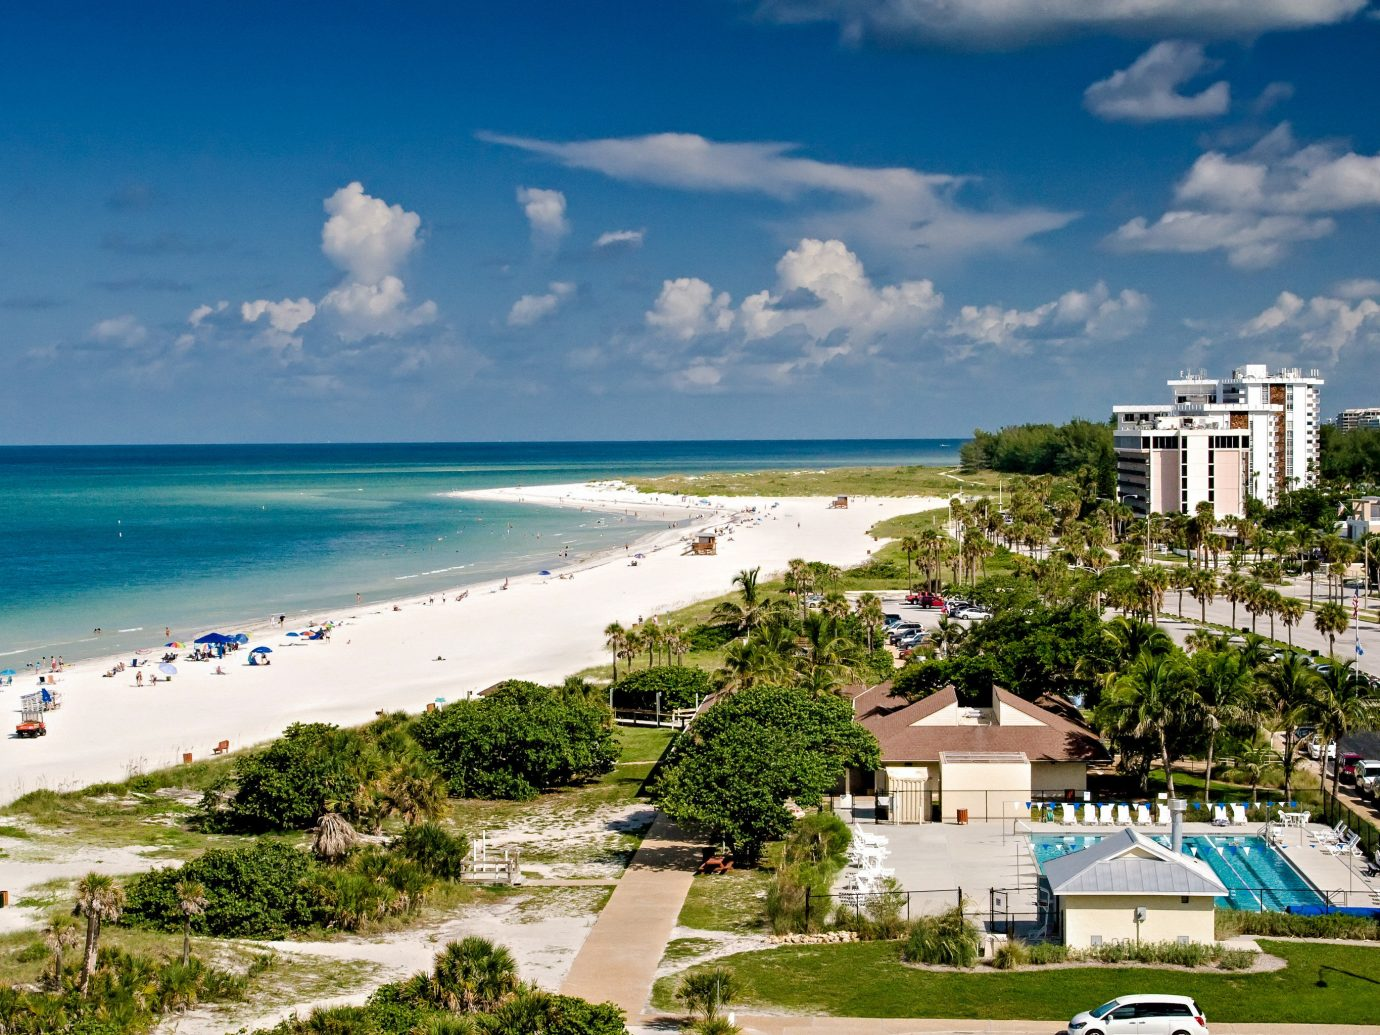 Trip Ideas sky outdoor Beach Sea Coast shore body of water Ocean Nature vacation caribbean horizon bay cape Resort tropics Island day